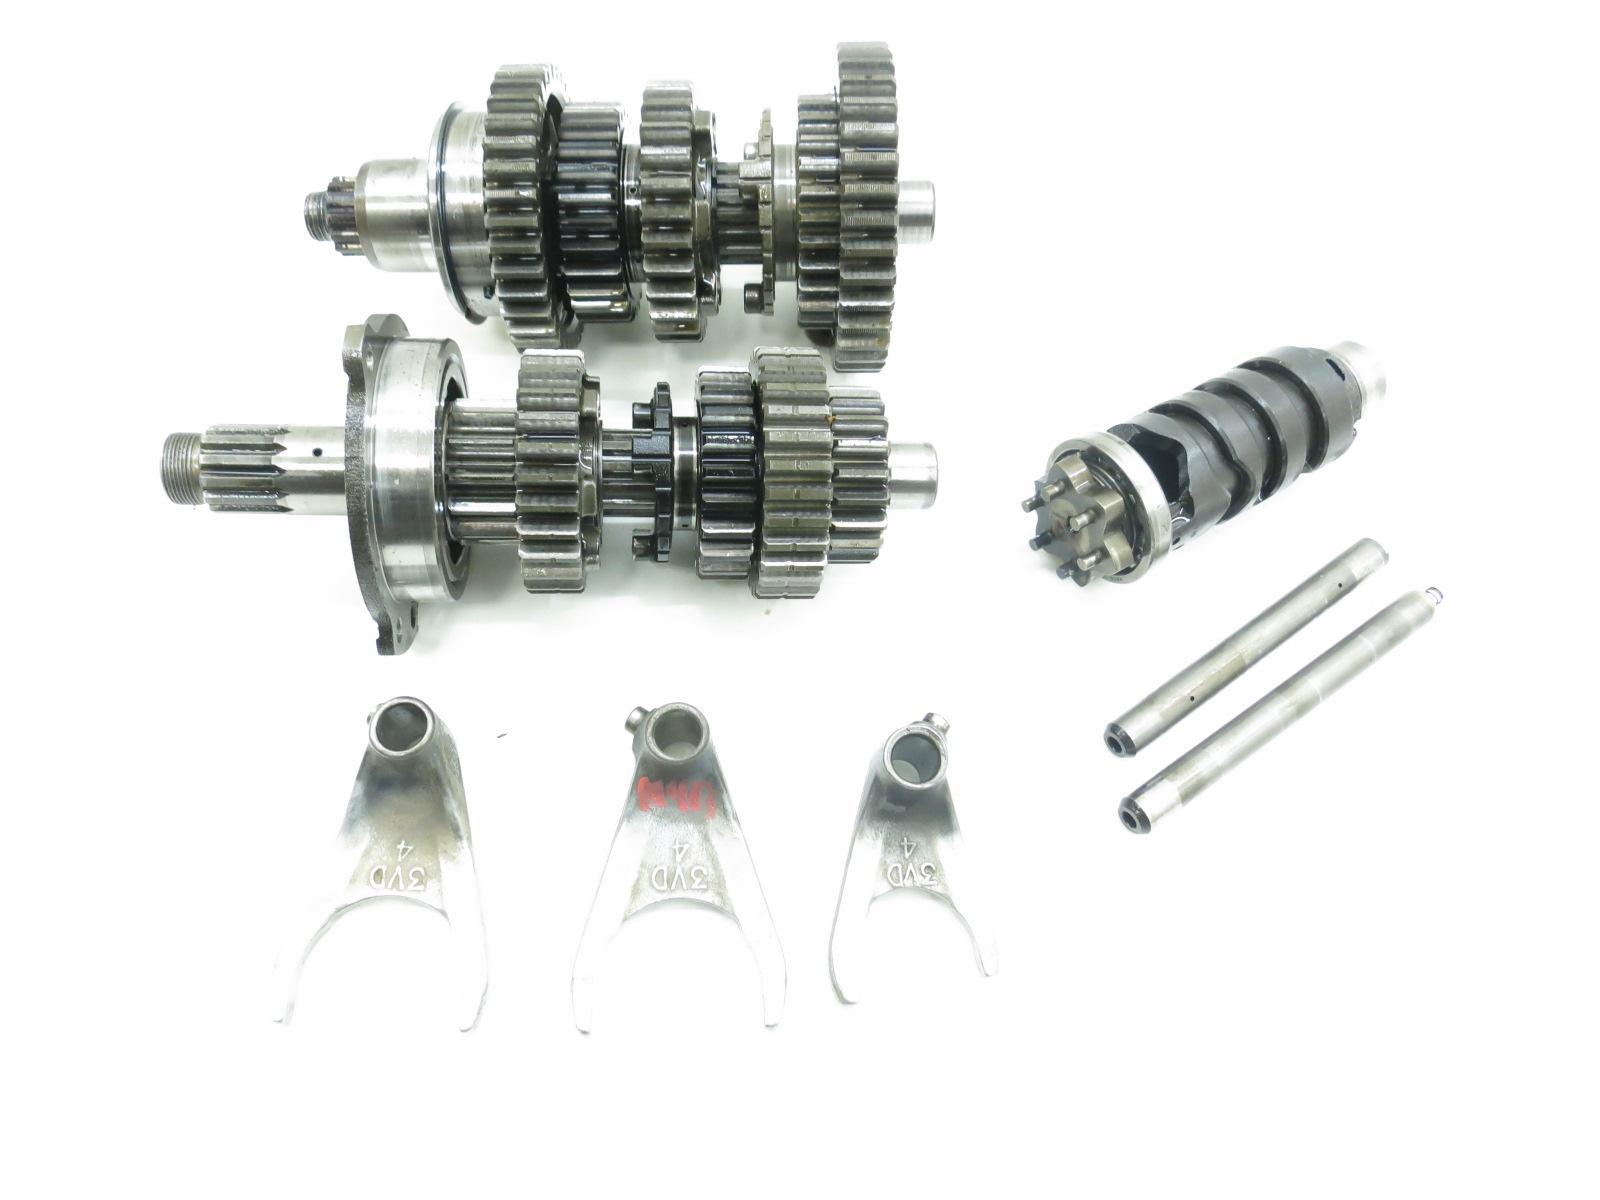 YAMAHA TDM 850 (3VD) Getriebe komplett transmission gear